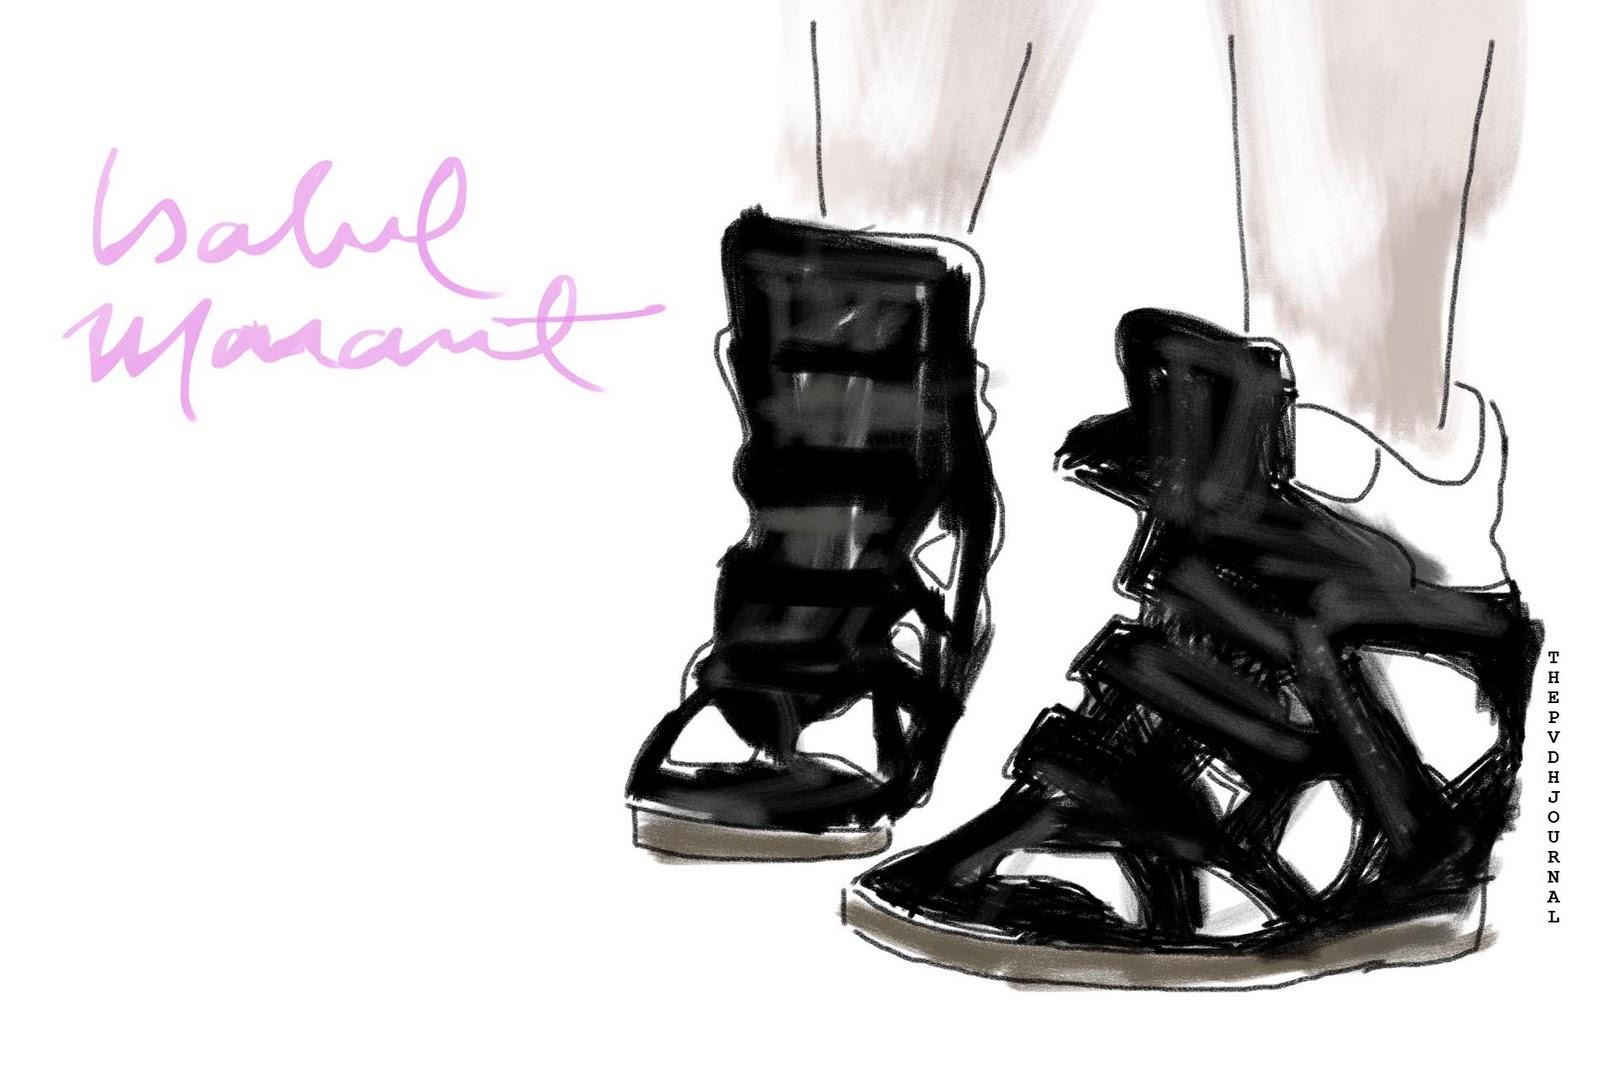 http://4.bp.blogspot.com/-9F5npA0bnPk/T8O95XmooeI/AAAAAAAAAeM/FCFrX_5CV58/s1600/Isabel+Marant+Willow+Bekket+Sneakers.jpg